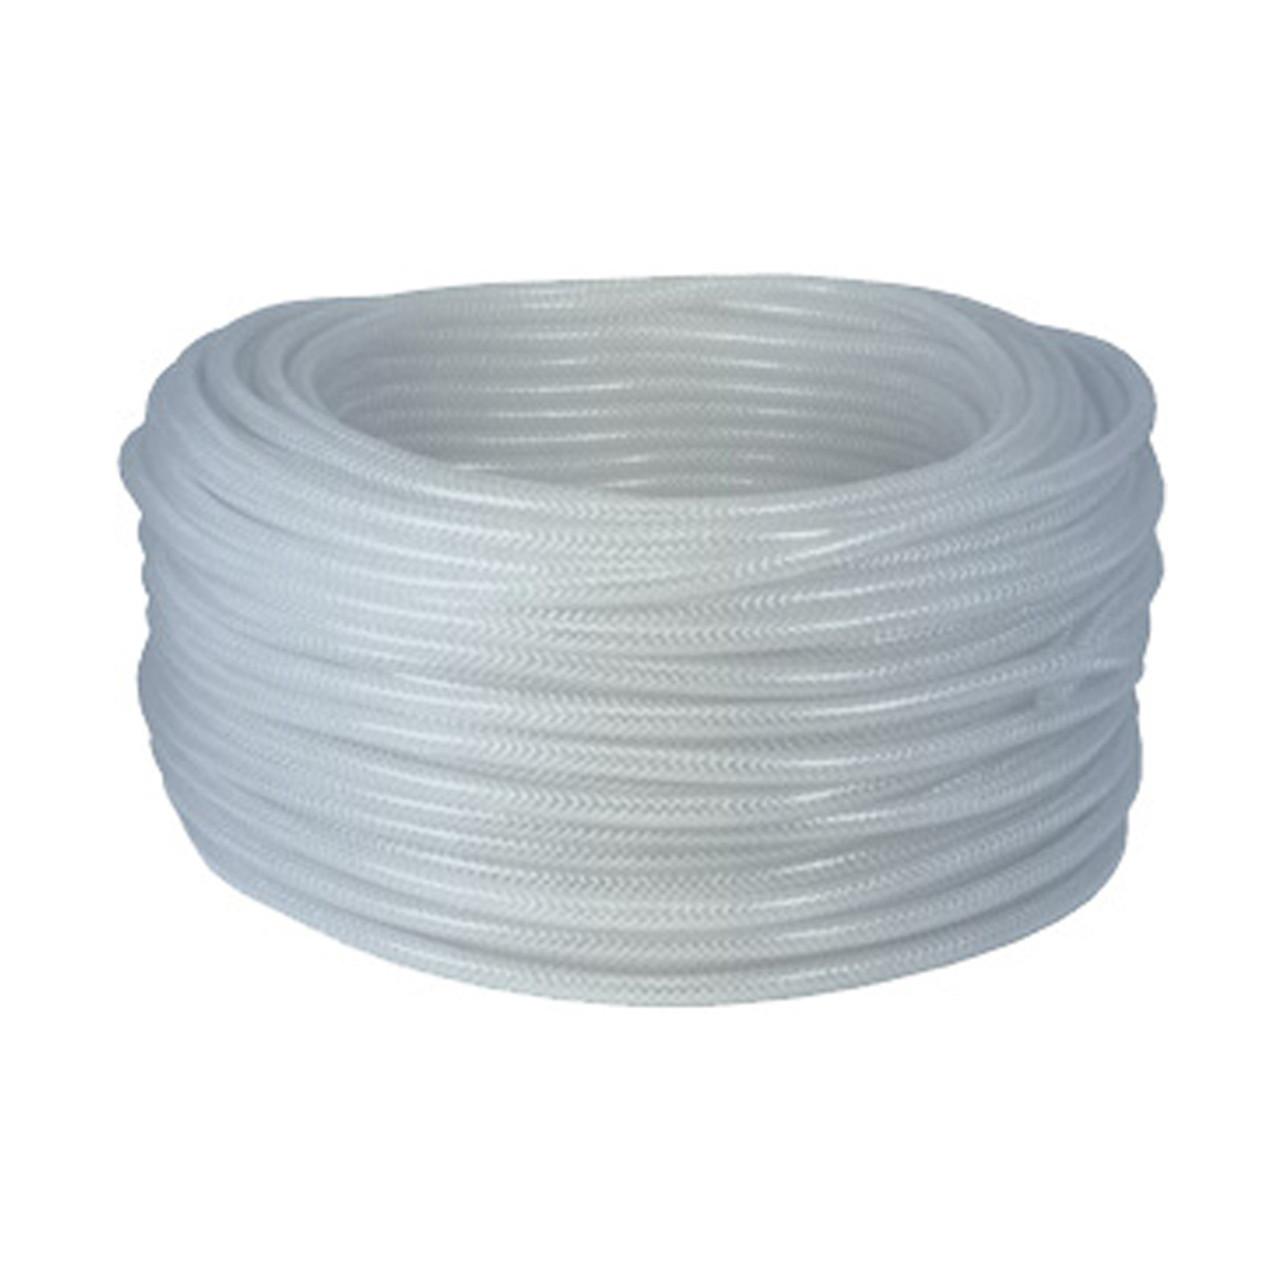 Dixon 3/8 in. ID x 5/8 in. OD Domestic Clear Braided PVC Tubing, 265 ...